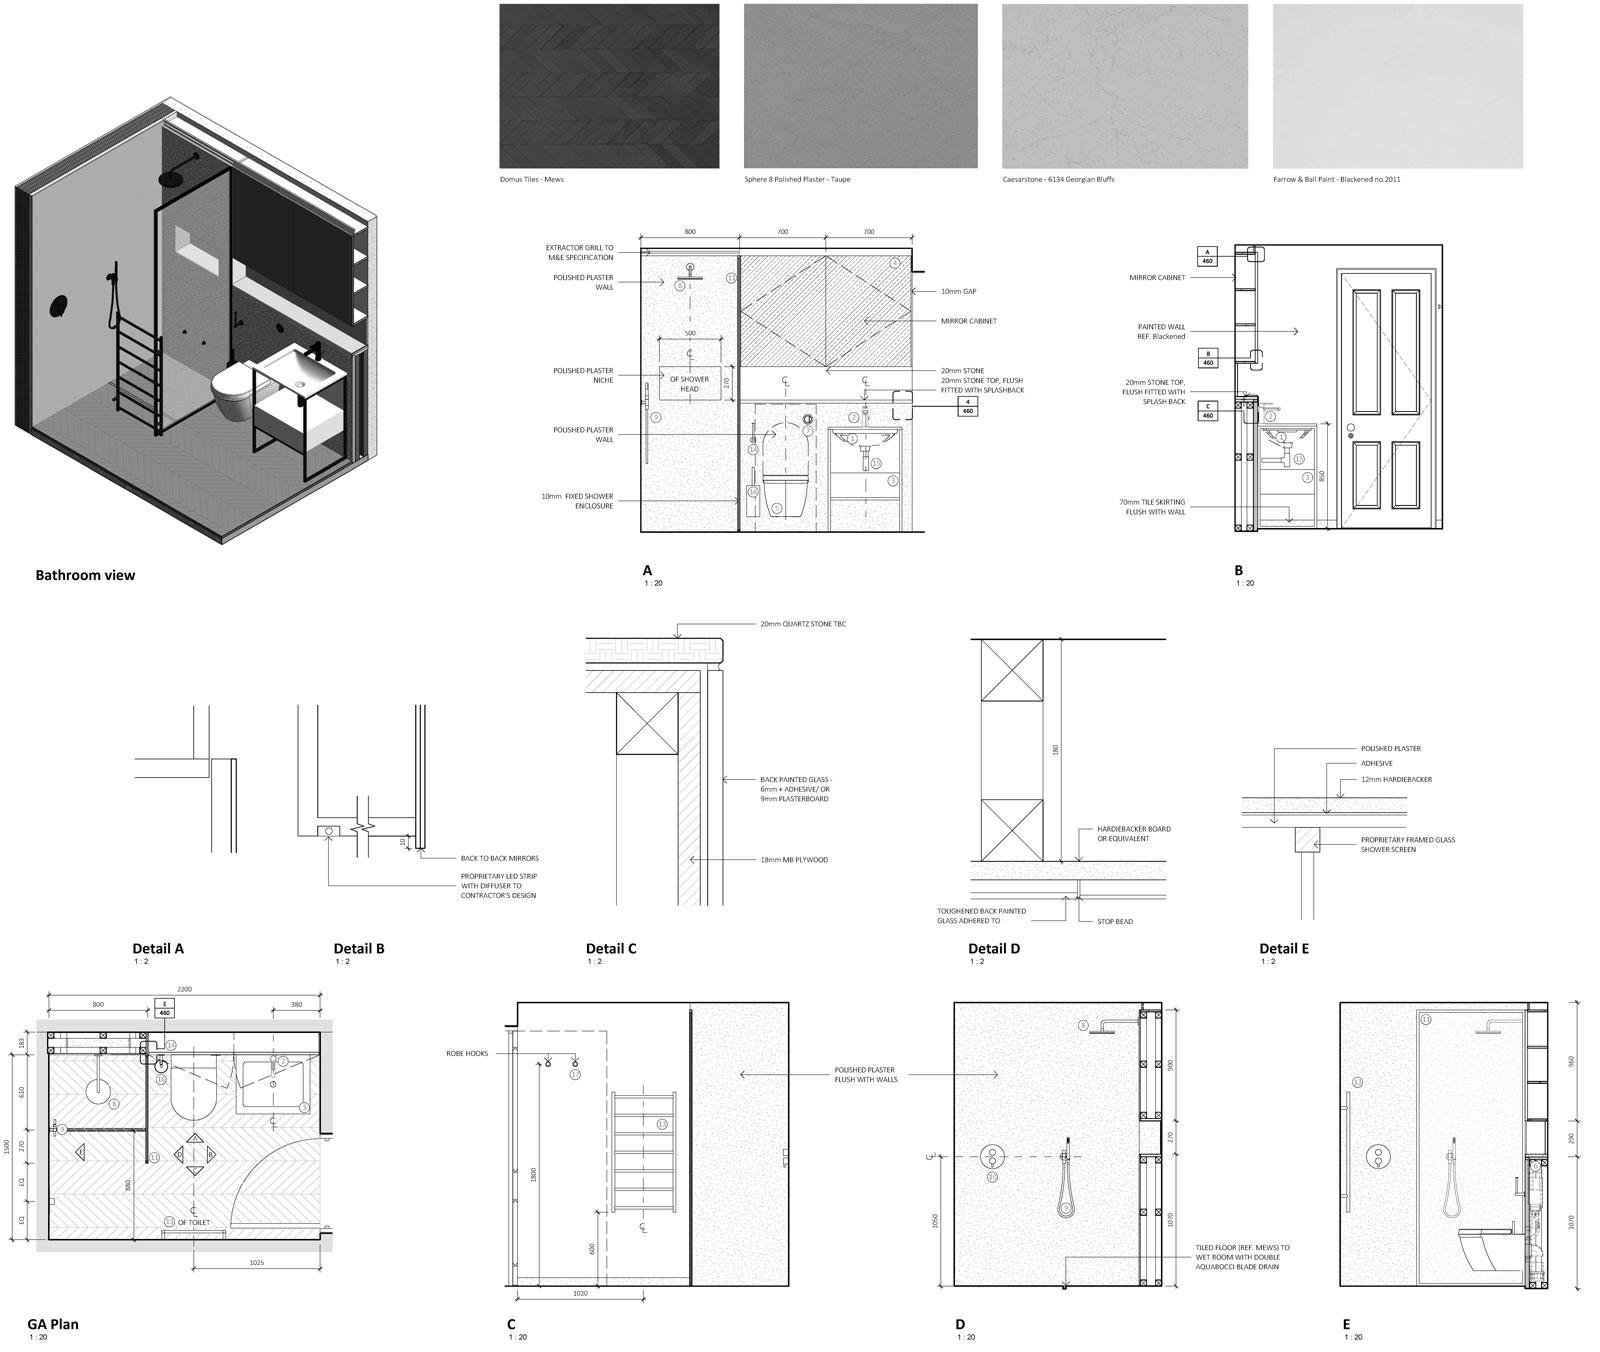 Example BIM drawing of bathroom